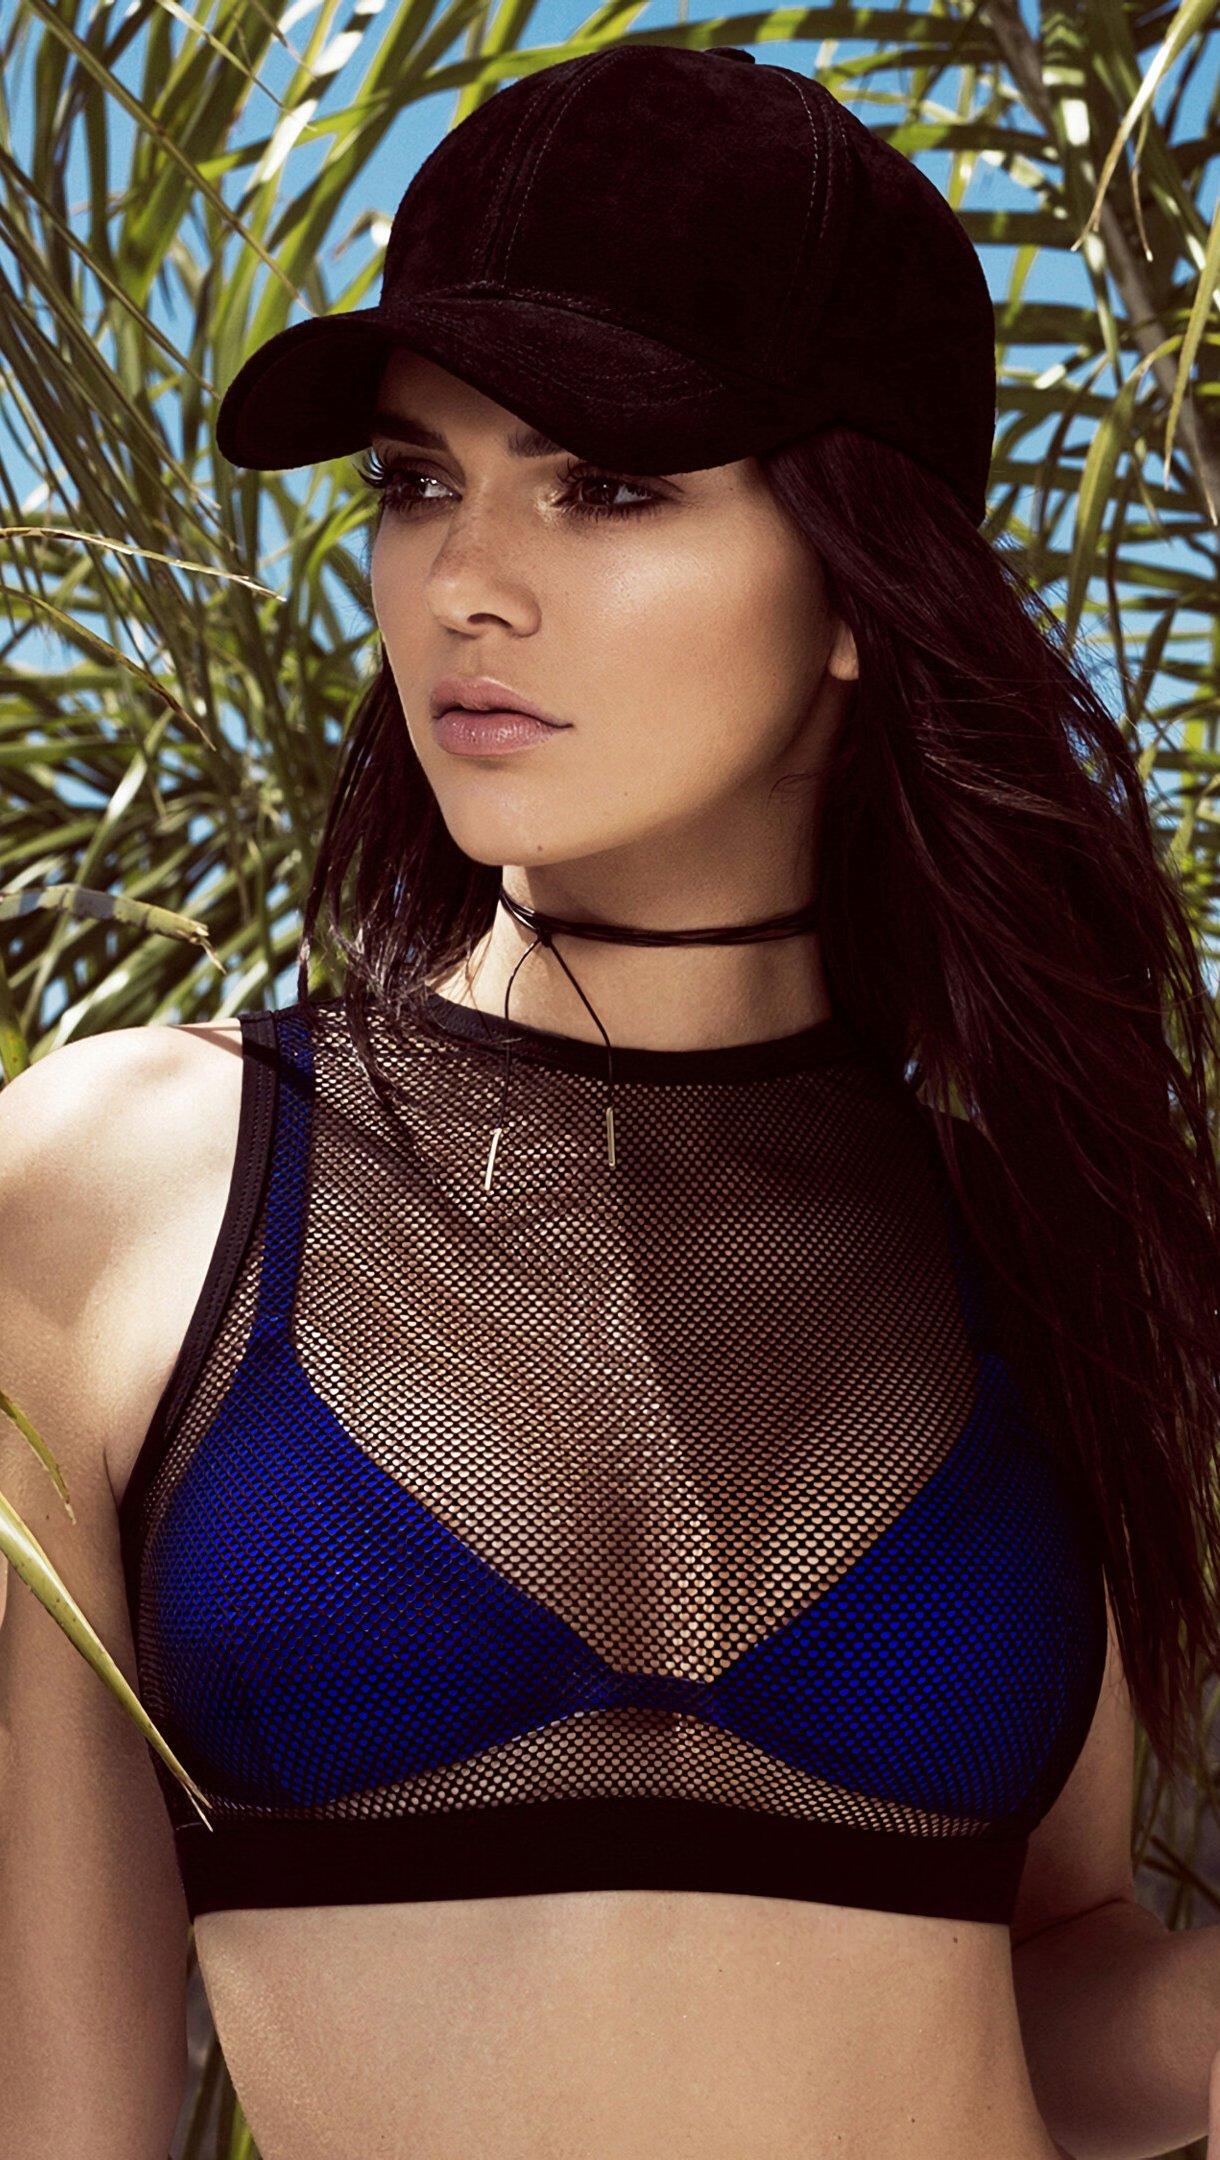 Fondos de pantalla Kendall Jenner en la playa Vertical